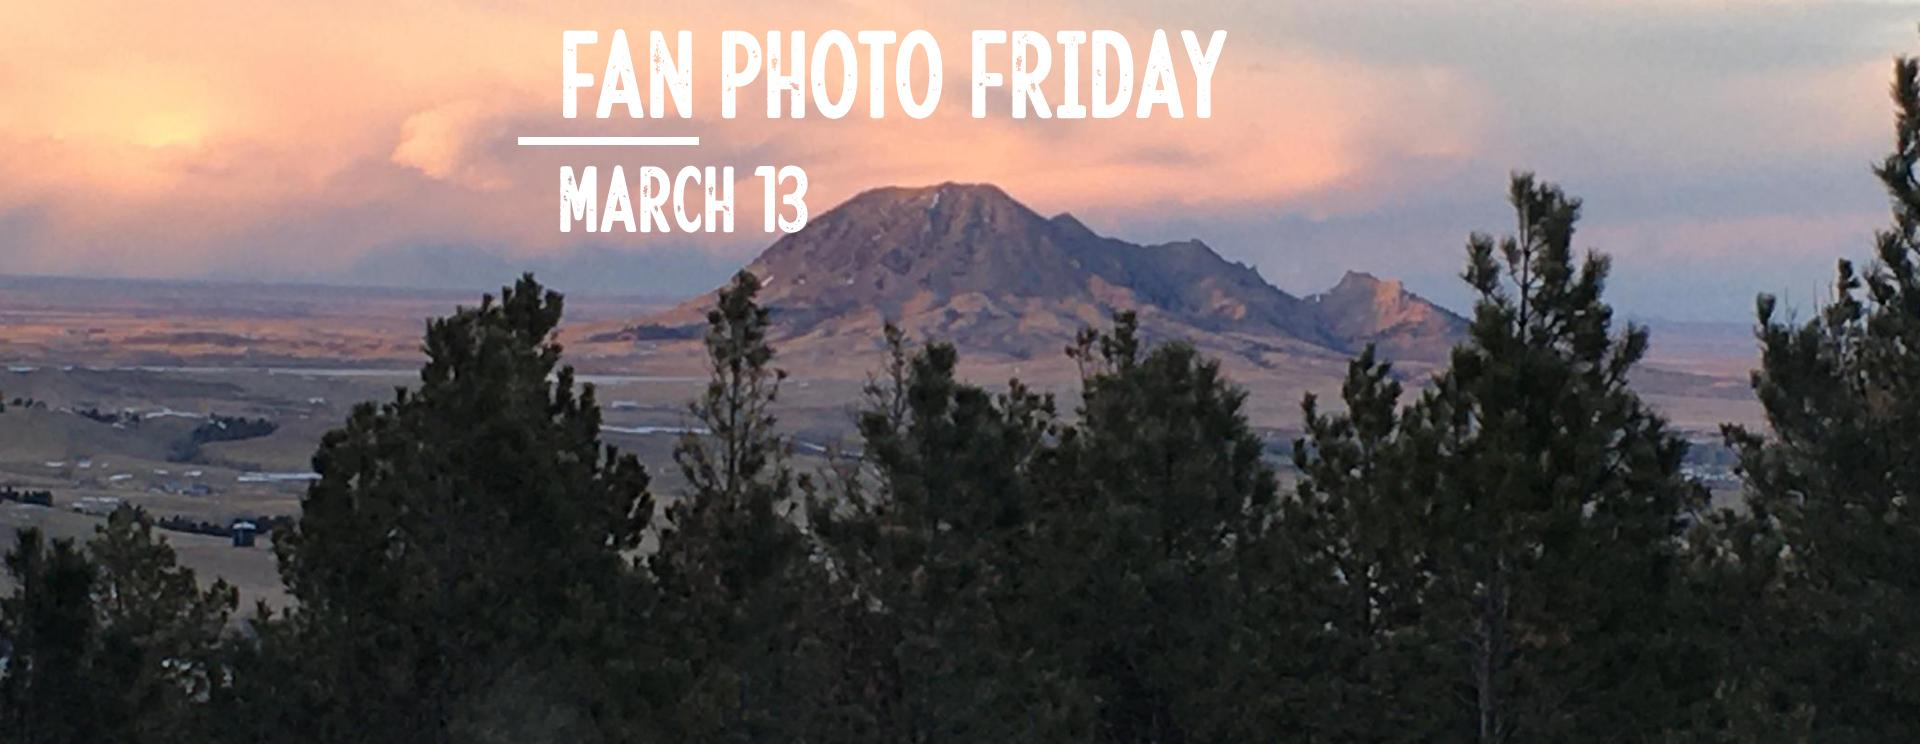 Fan Photo Friday | March 13, 2020